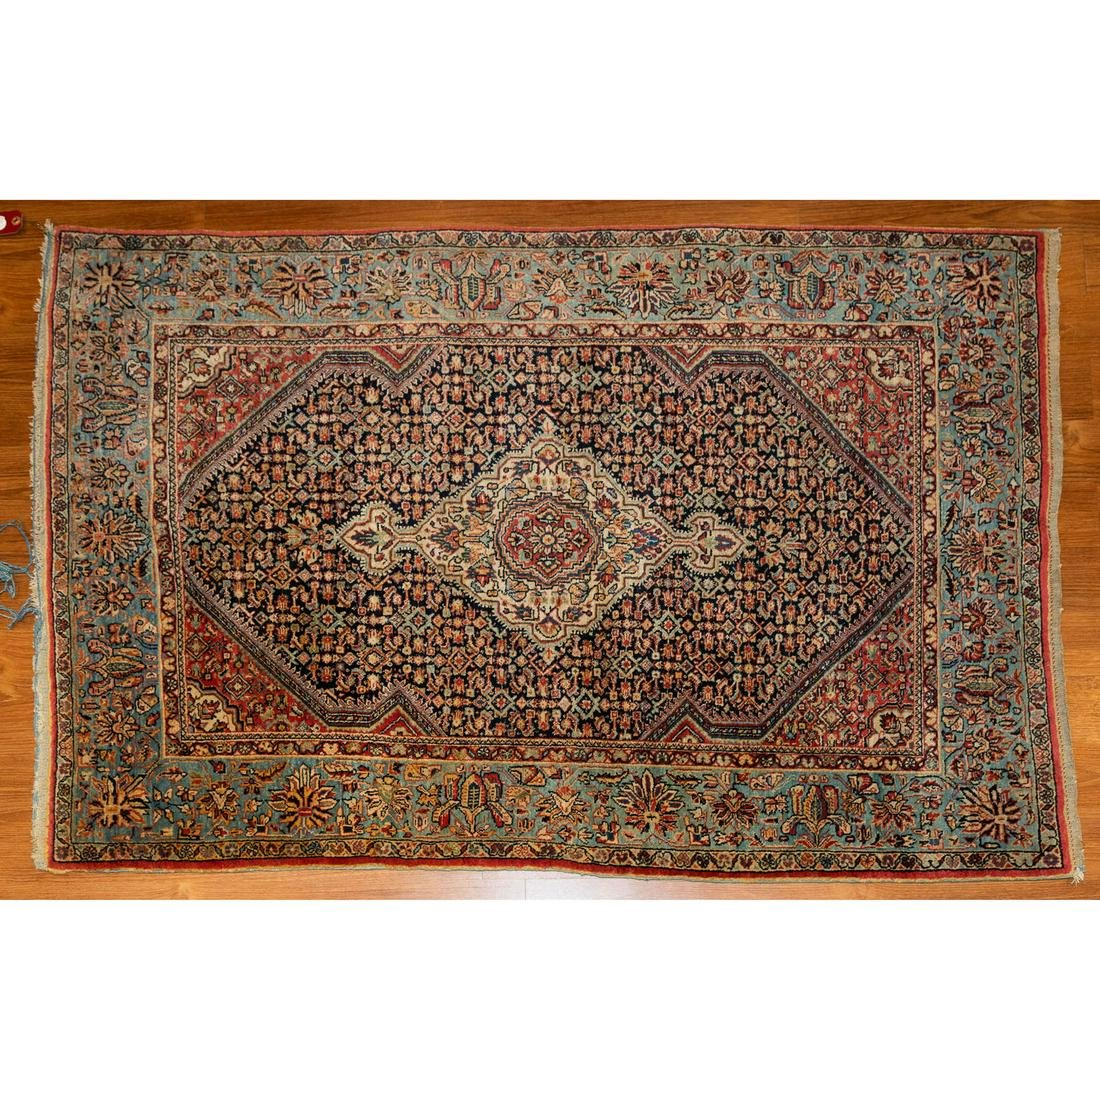 Antique Bijar Rug, Persia, 3.5 x 5